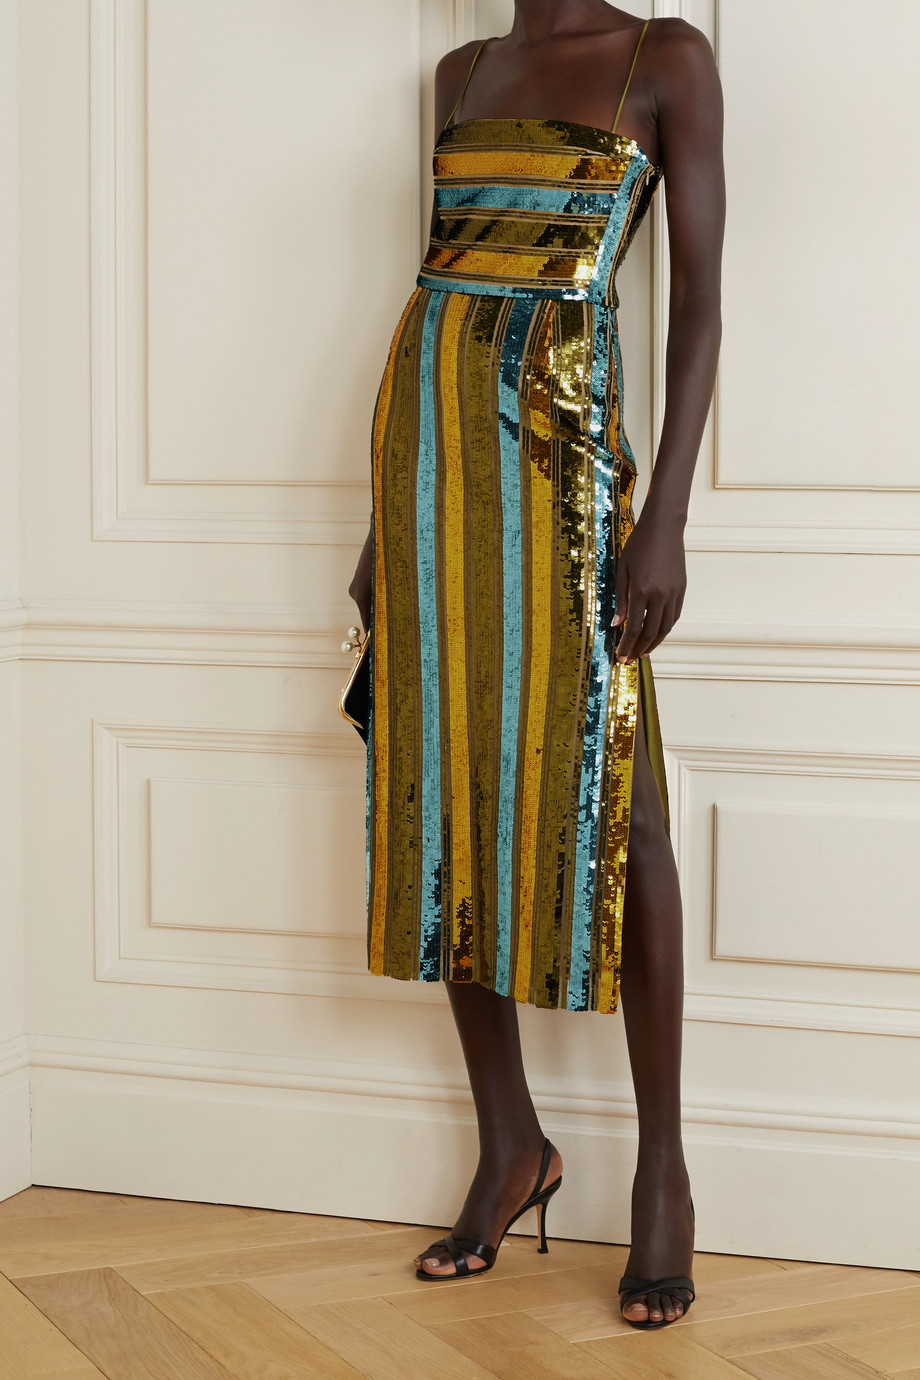 Galvan Stargaze striped sequined tulle midi dress